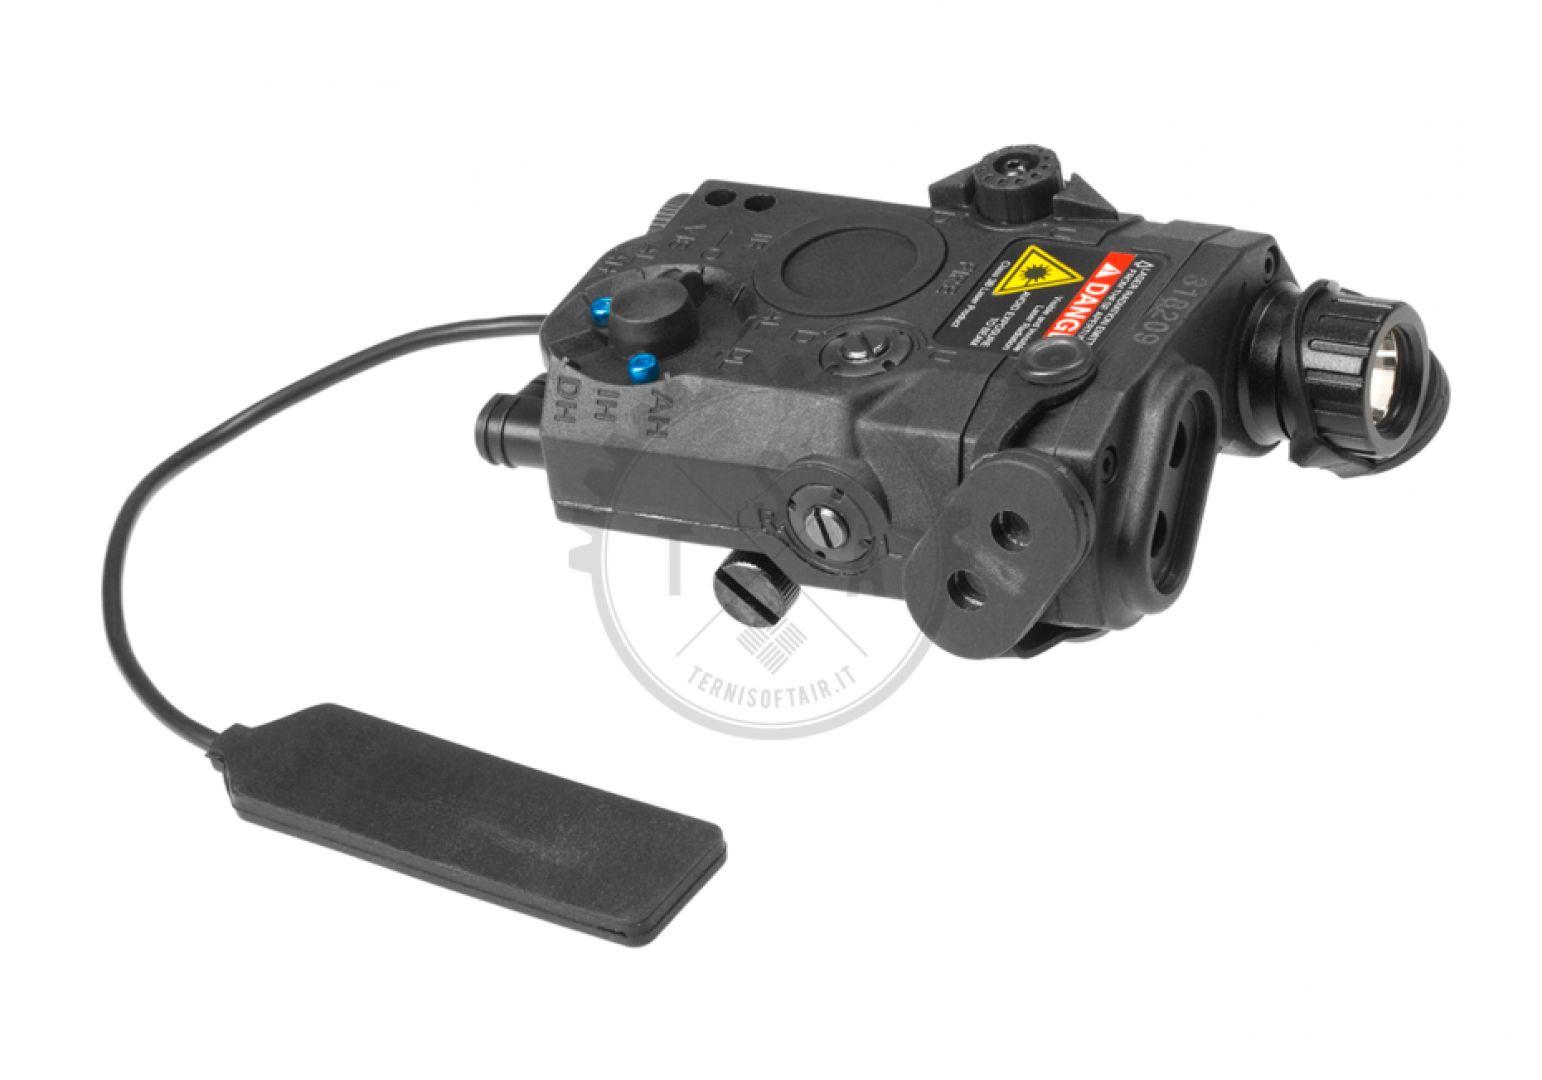 AN/PEQ-15 Illuminator / Laser Module